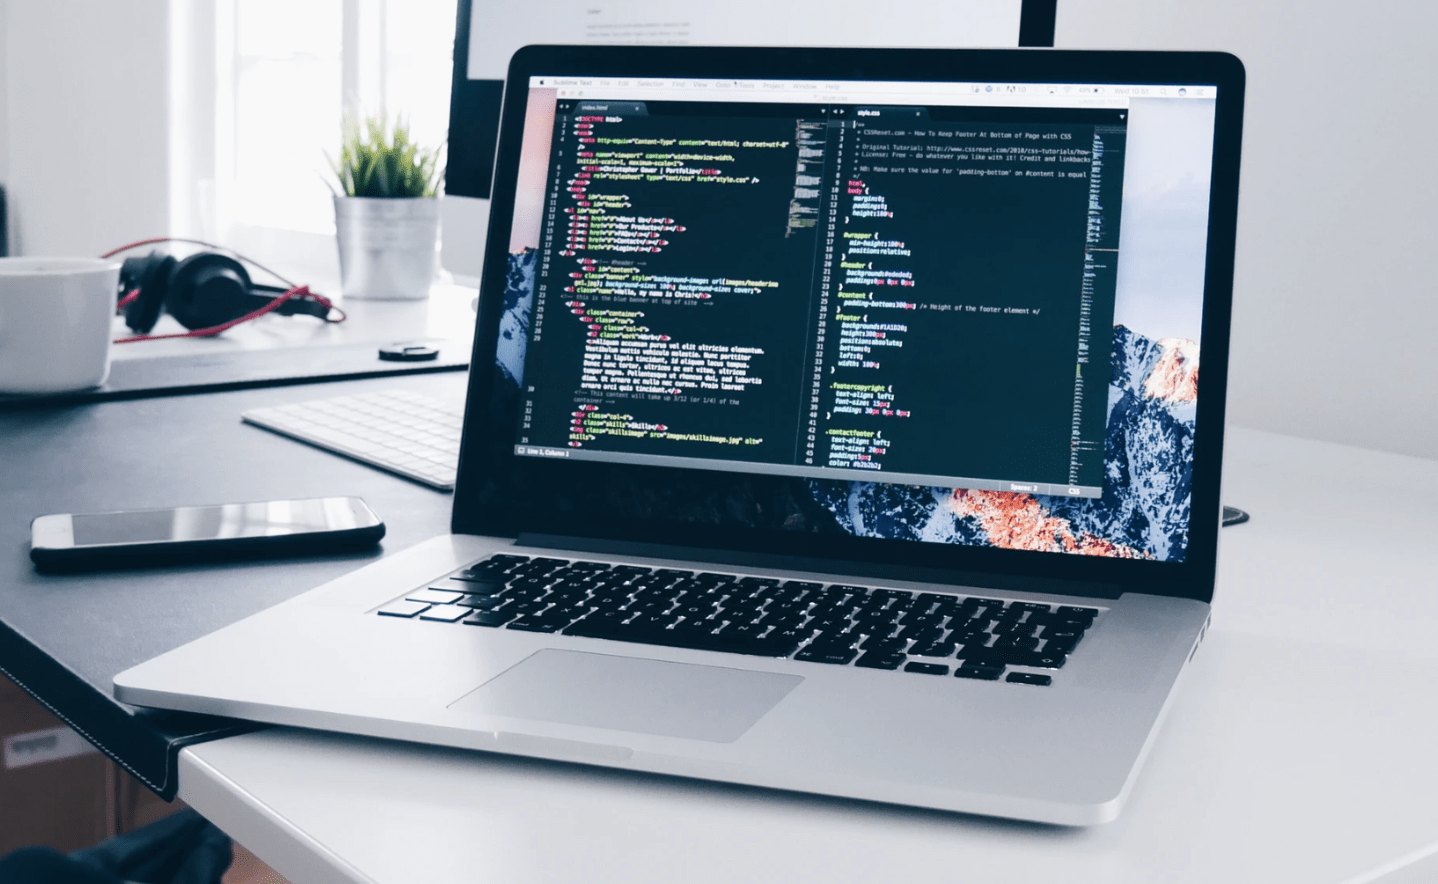 Top Java Developers and Development Companies 2020